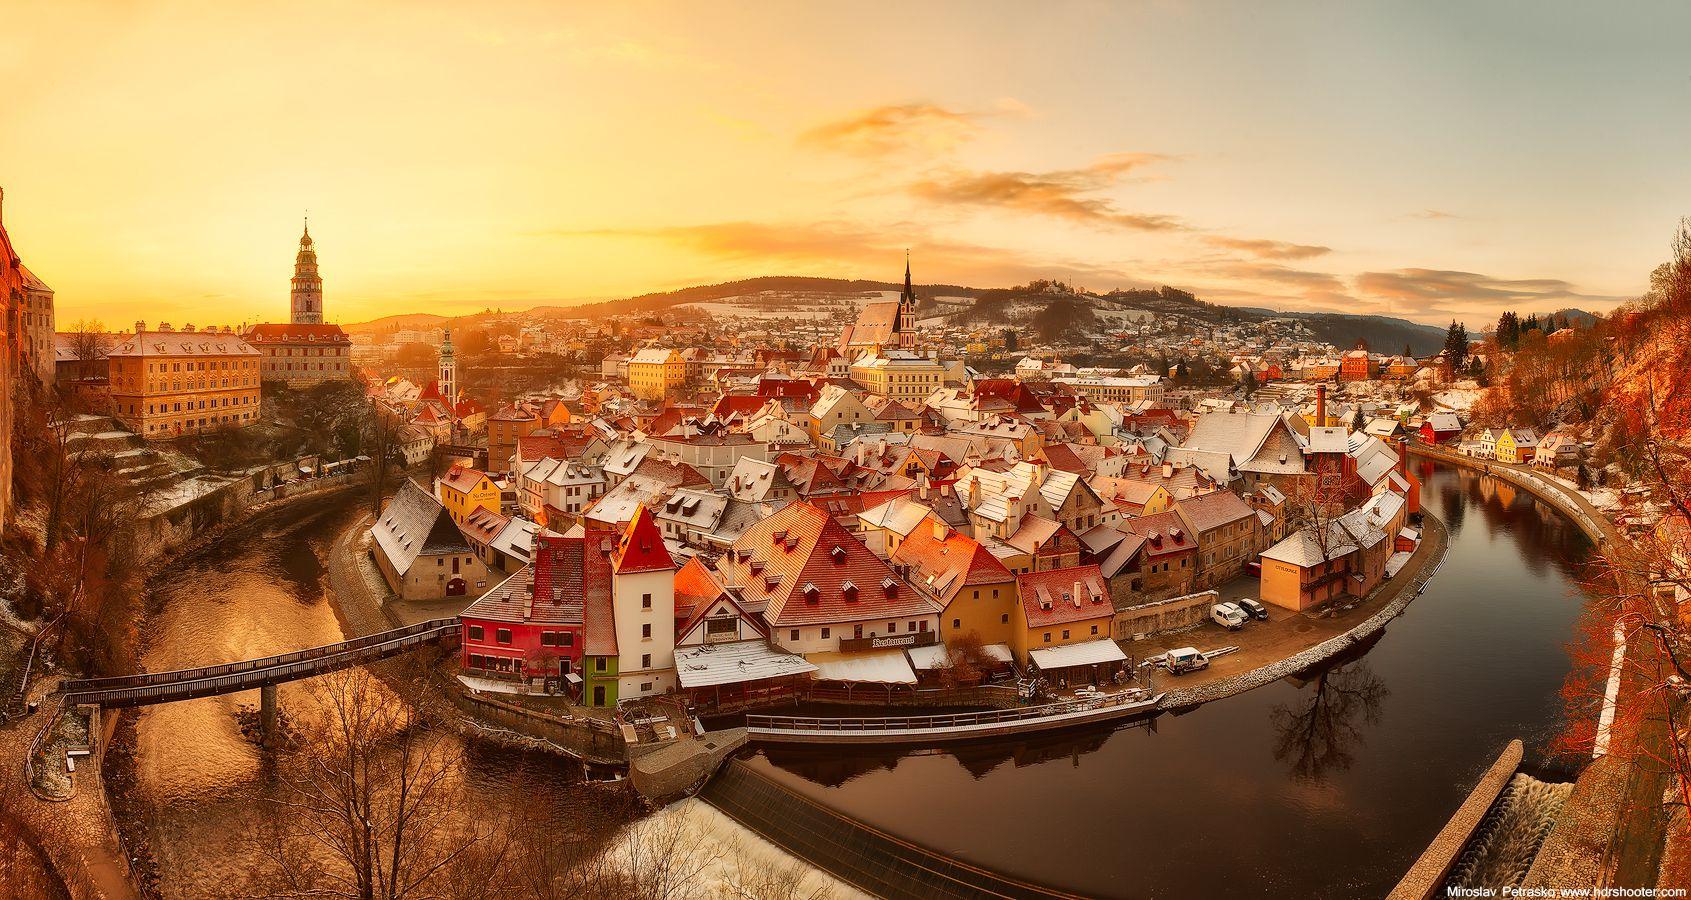 Beautiful Winter Wallpapers Hd Top 5 Photography Spots Cesky Krumlov Hdrshooter